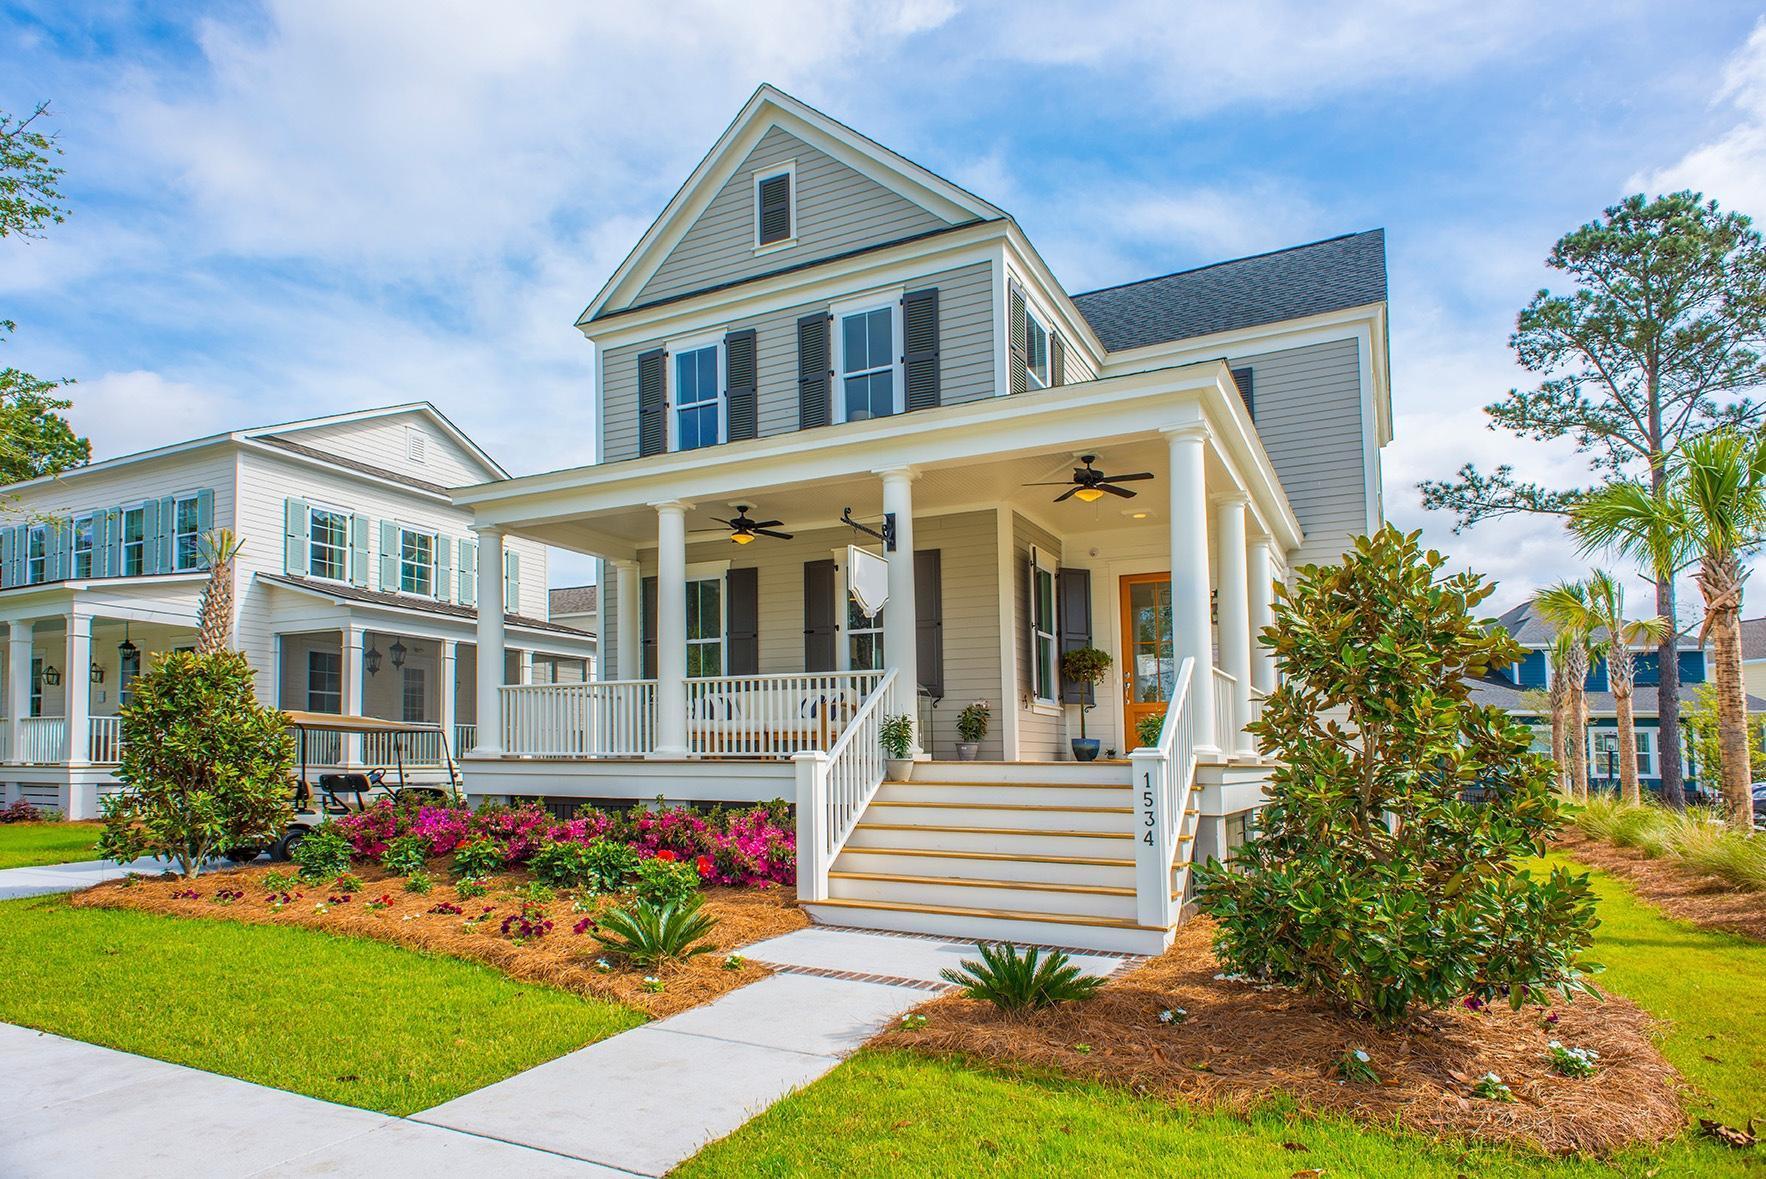 Carolina Park Homes For Sale - 1534 Banning, Mount Pleasant, SC - 21